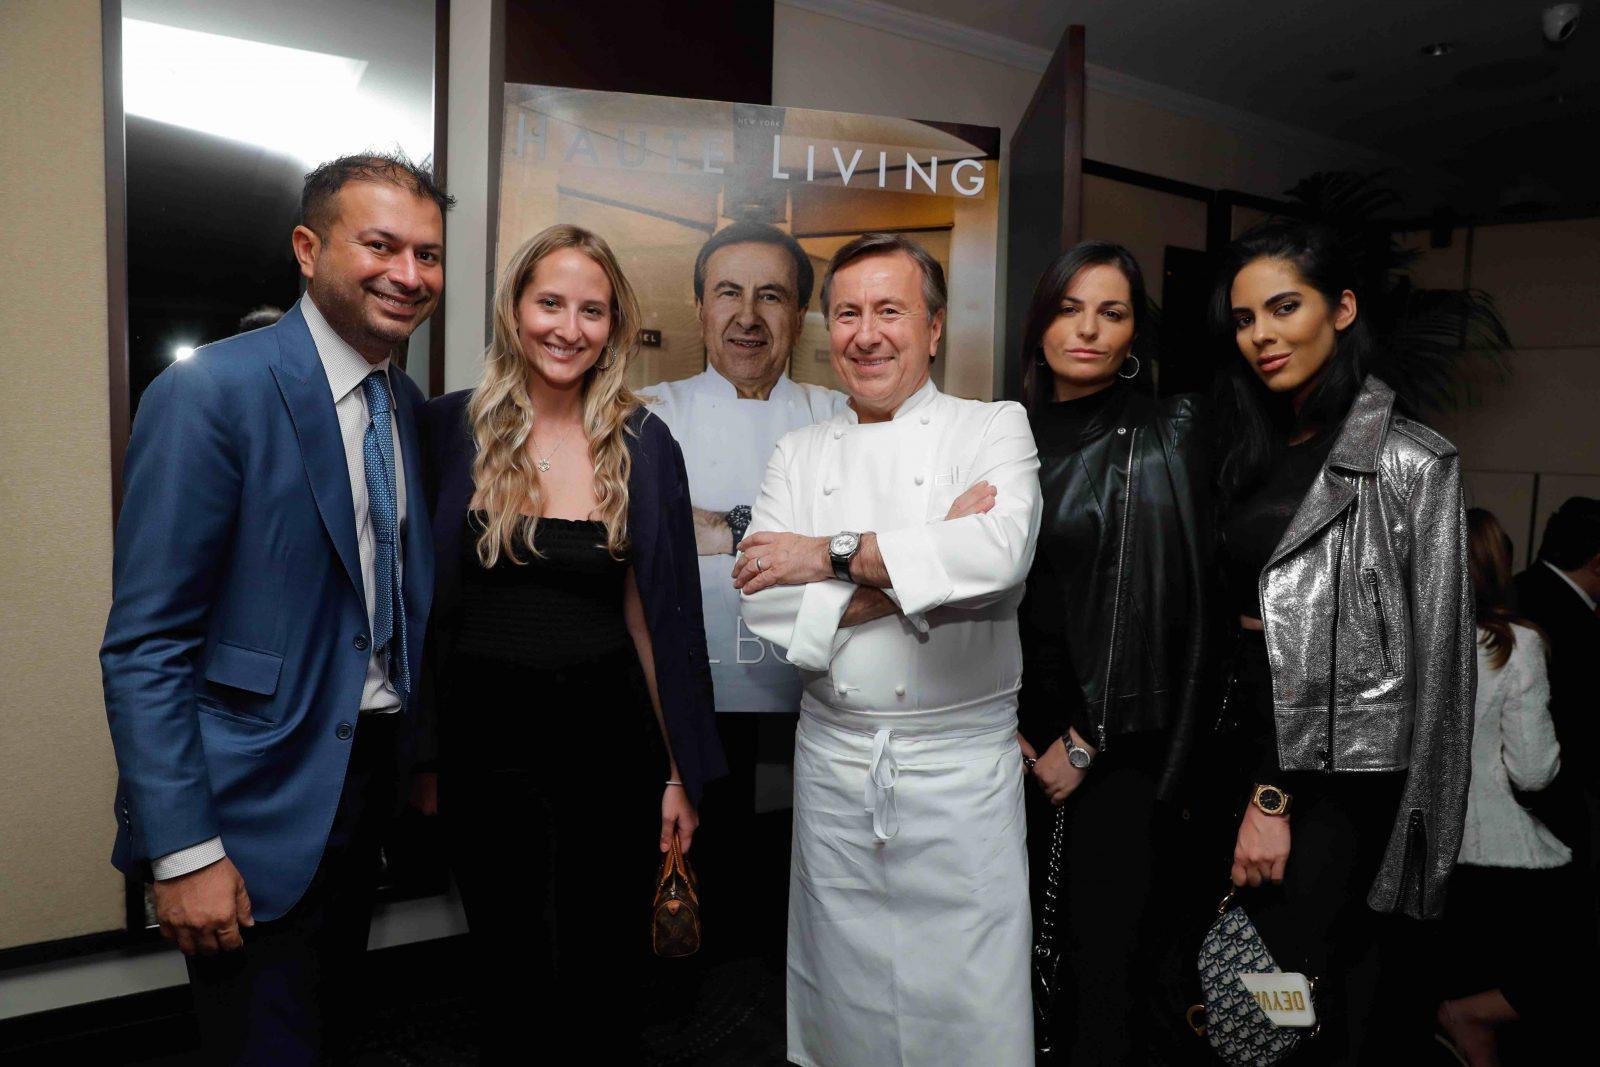 Kamal Hotchandani, Paige Mastrandrea, Chef Daniel Boulud, Lauren Mosseri and Deyvanshi Masrani